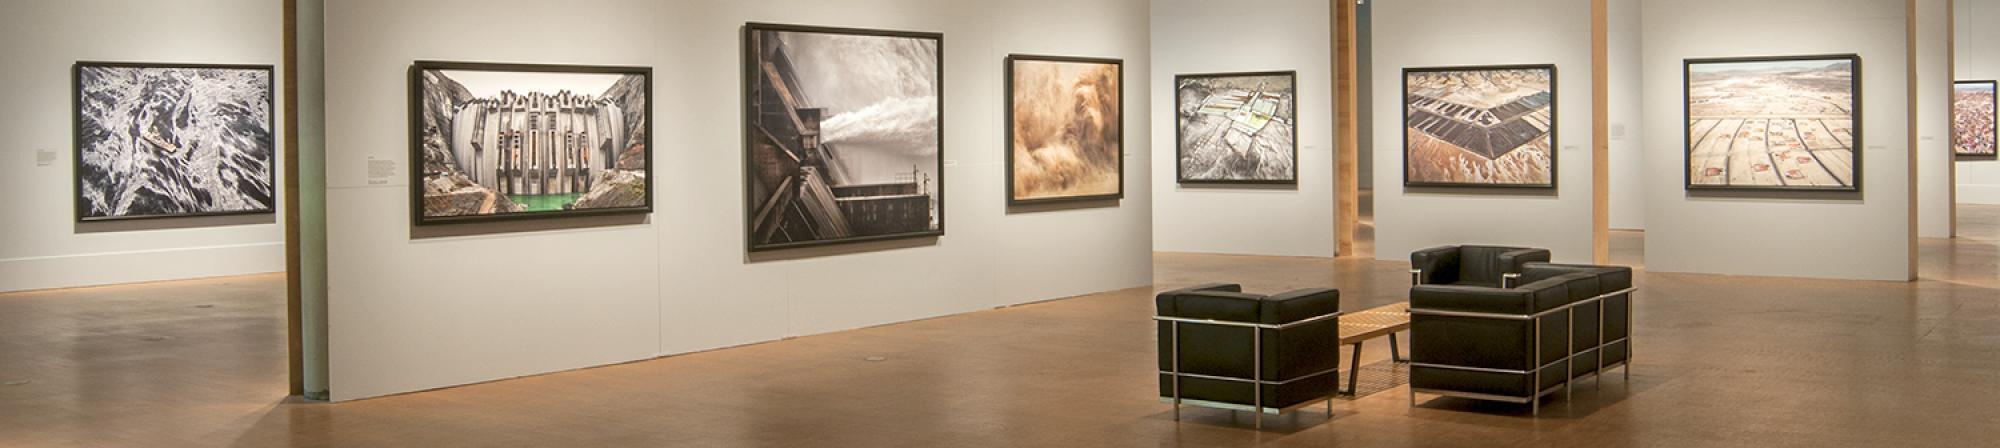 Installation of Edward Burtynsky: Water, on view summer 2014